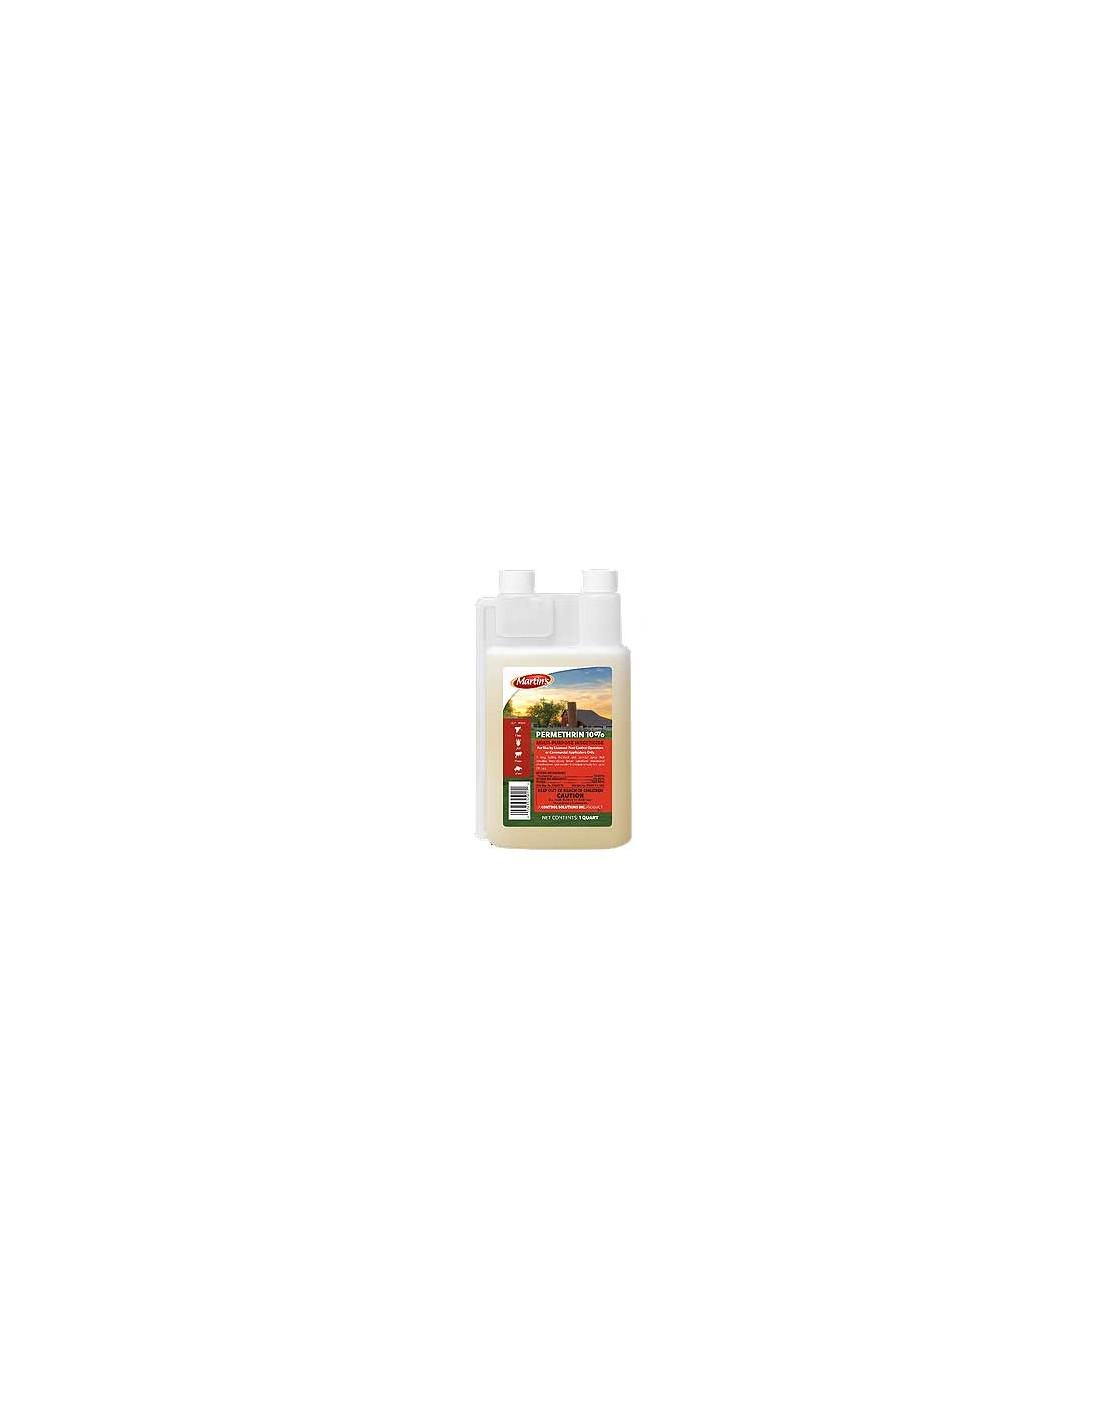 Permethrin 10% Multi Purpose Insecticide Questions & Answers